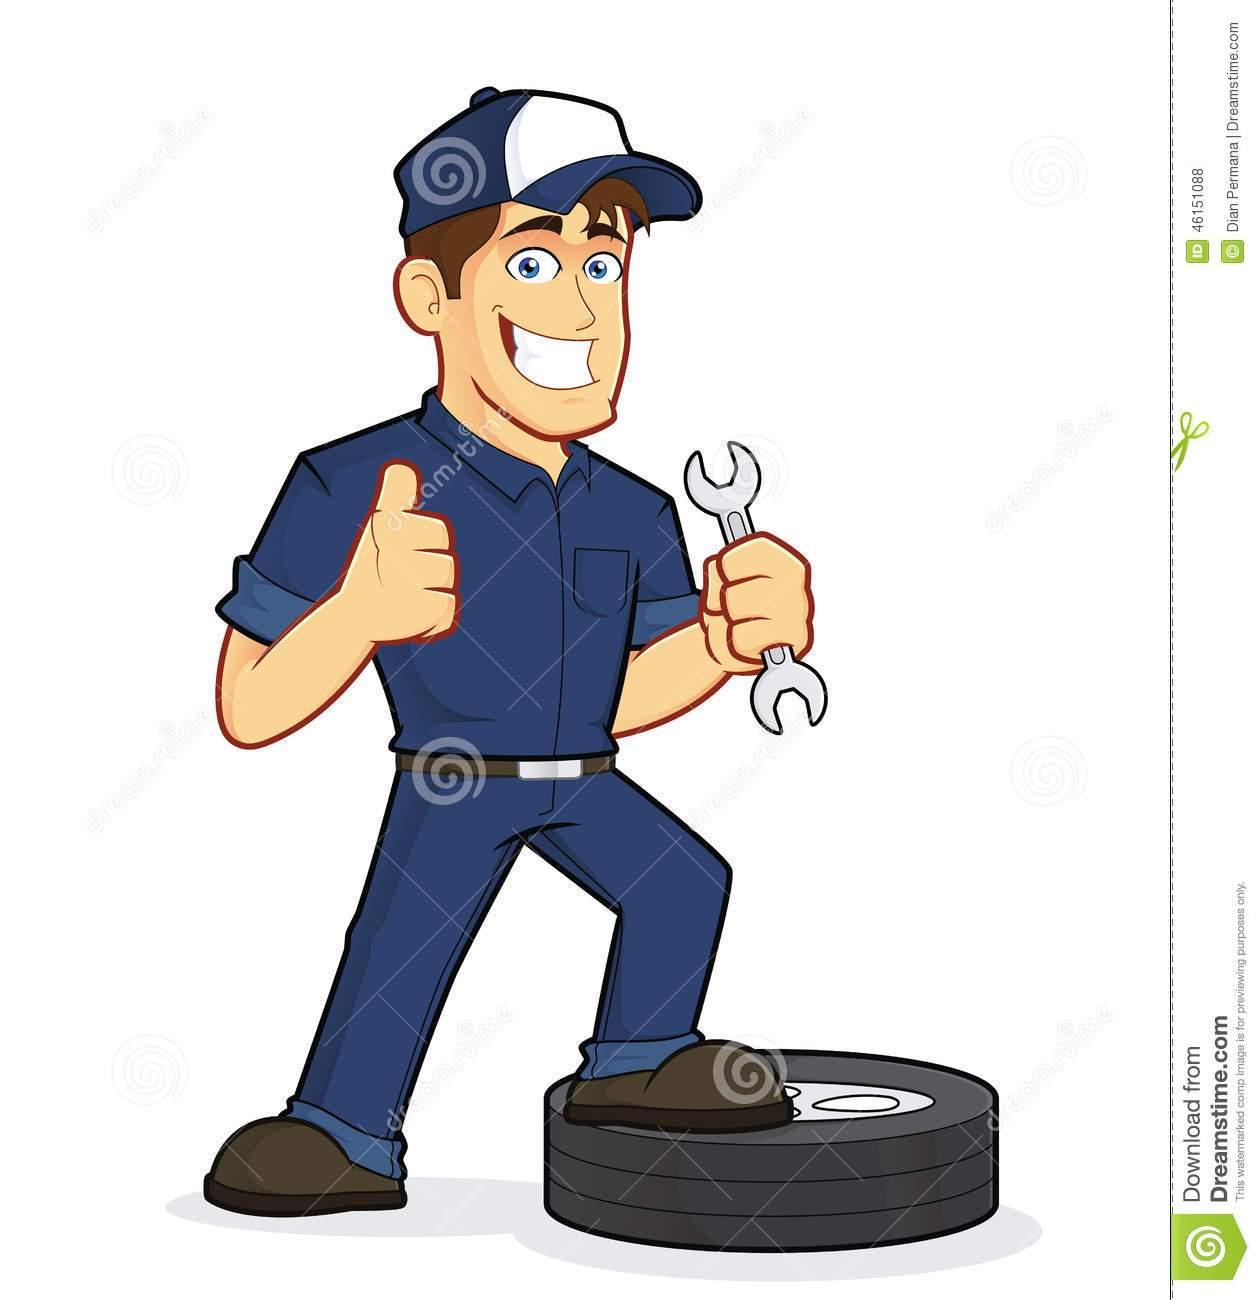 Free auto mechanic clipart 4 » Clipart Portal.